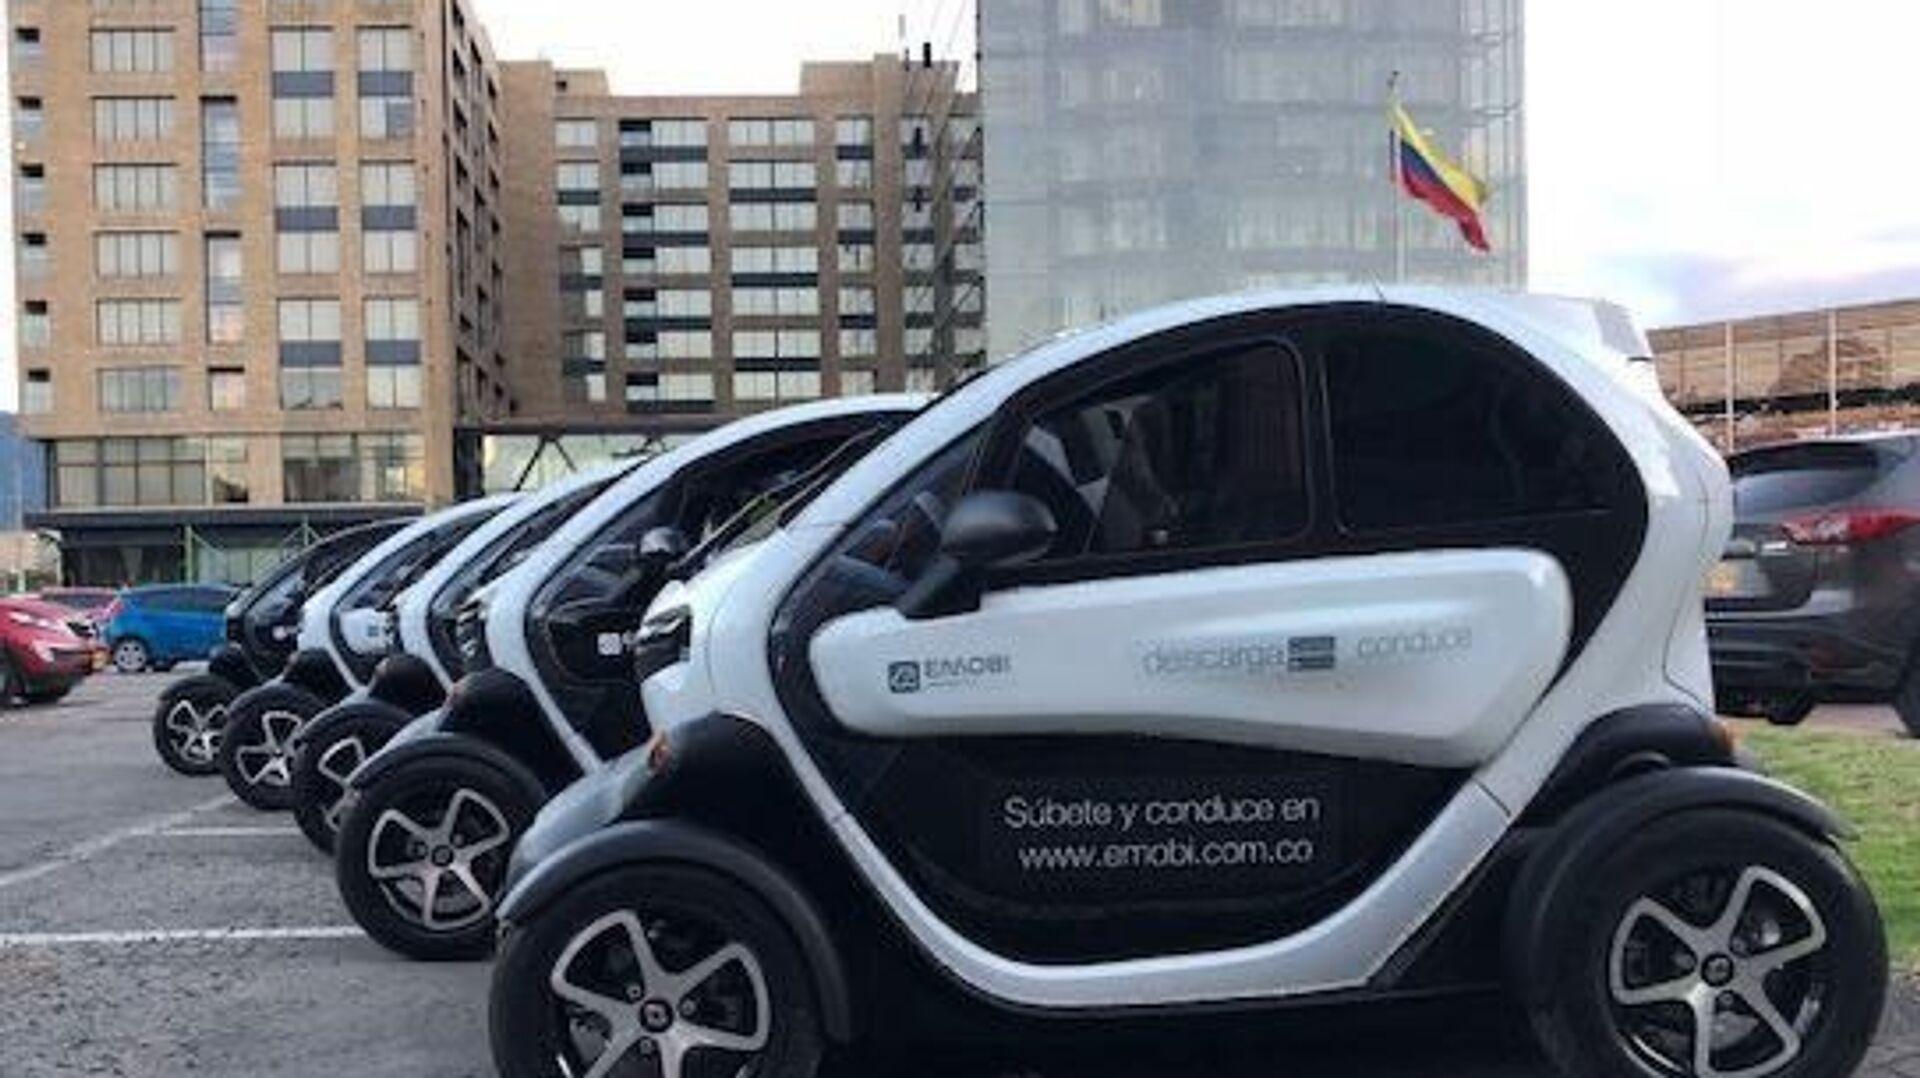 Auto eléctrico compartido en Bogotá - Sputnik Mundo, 1920, 29.03.2021